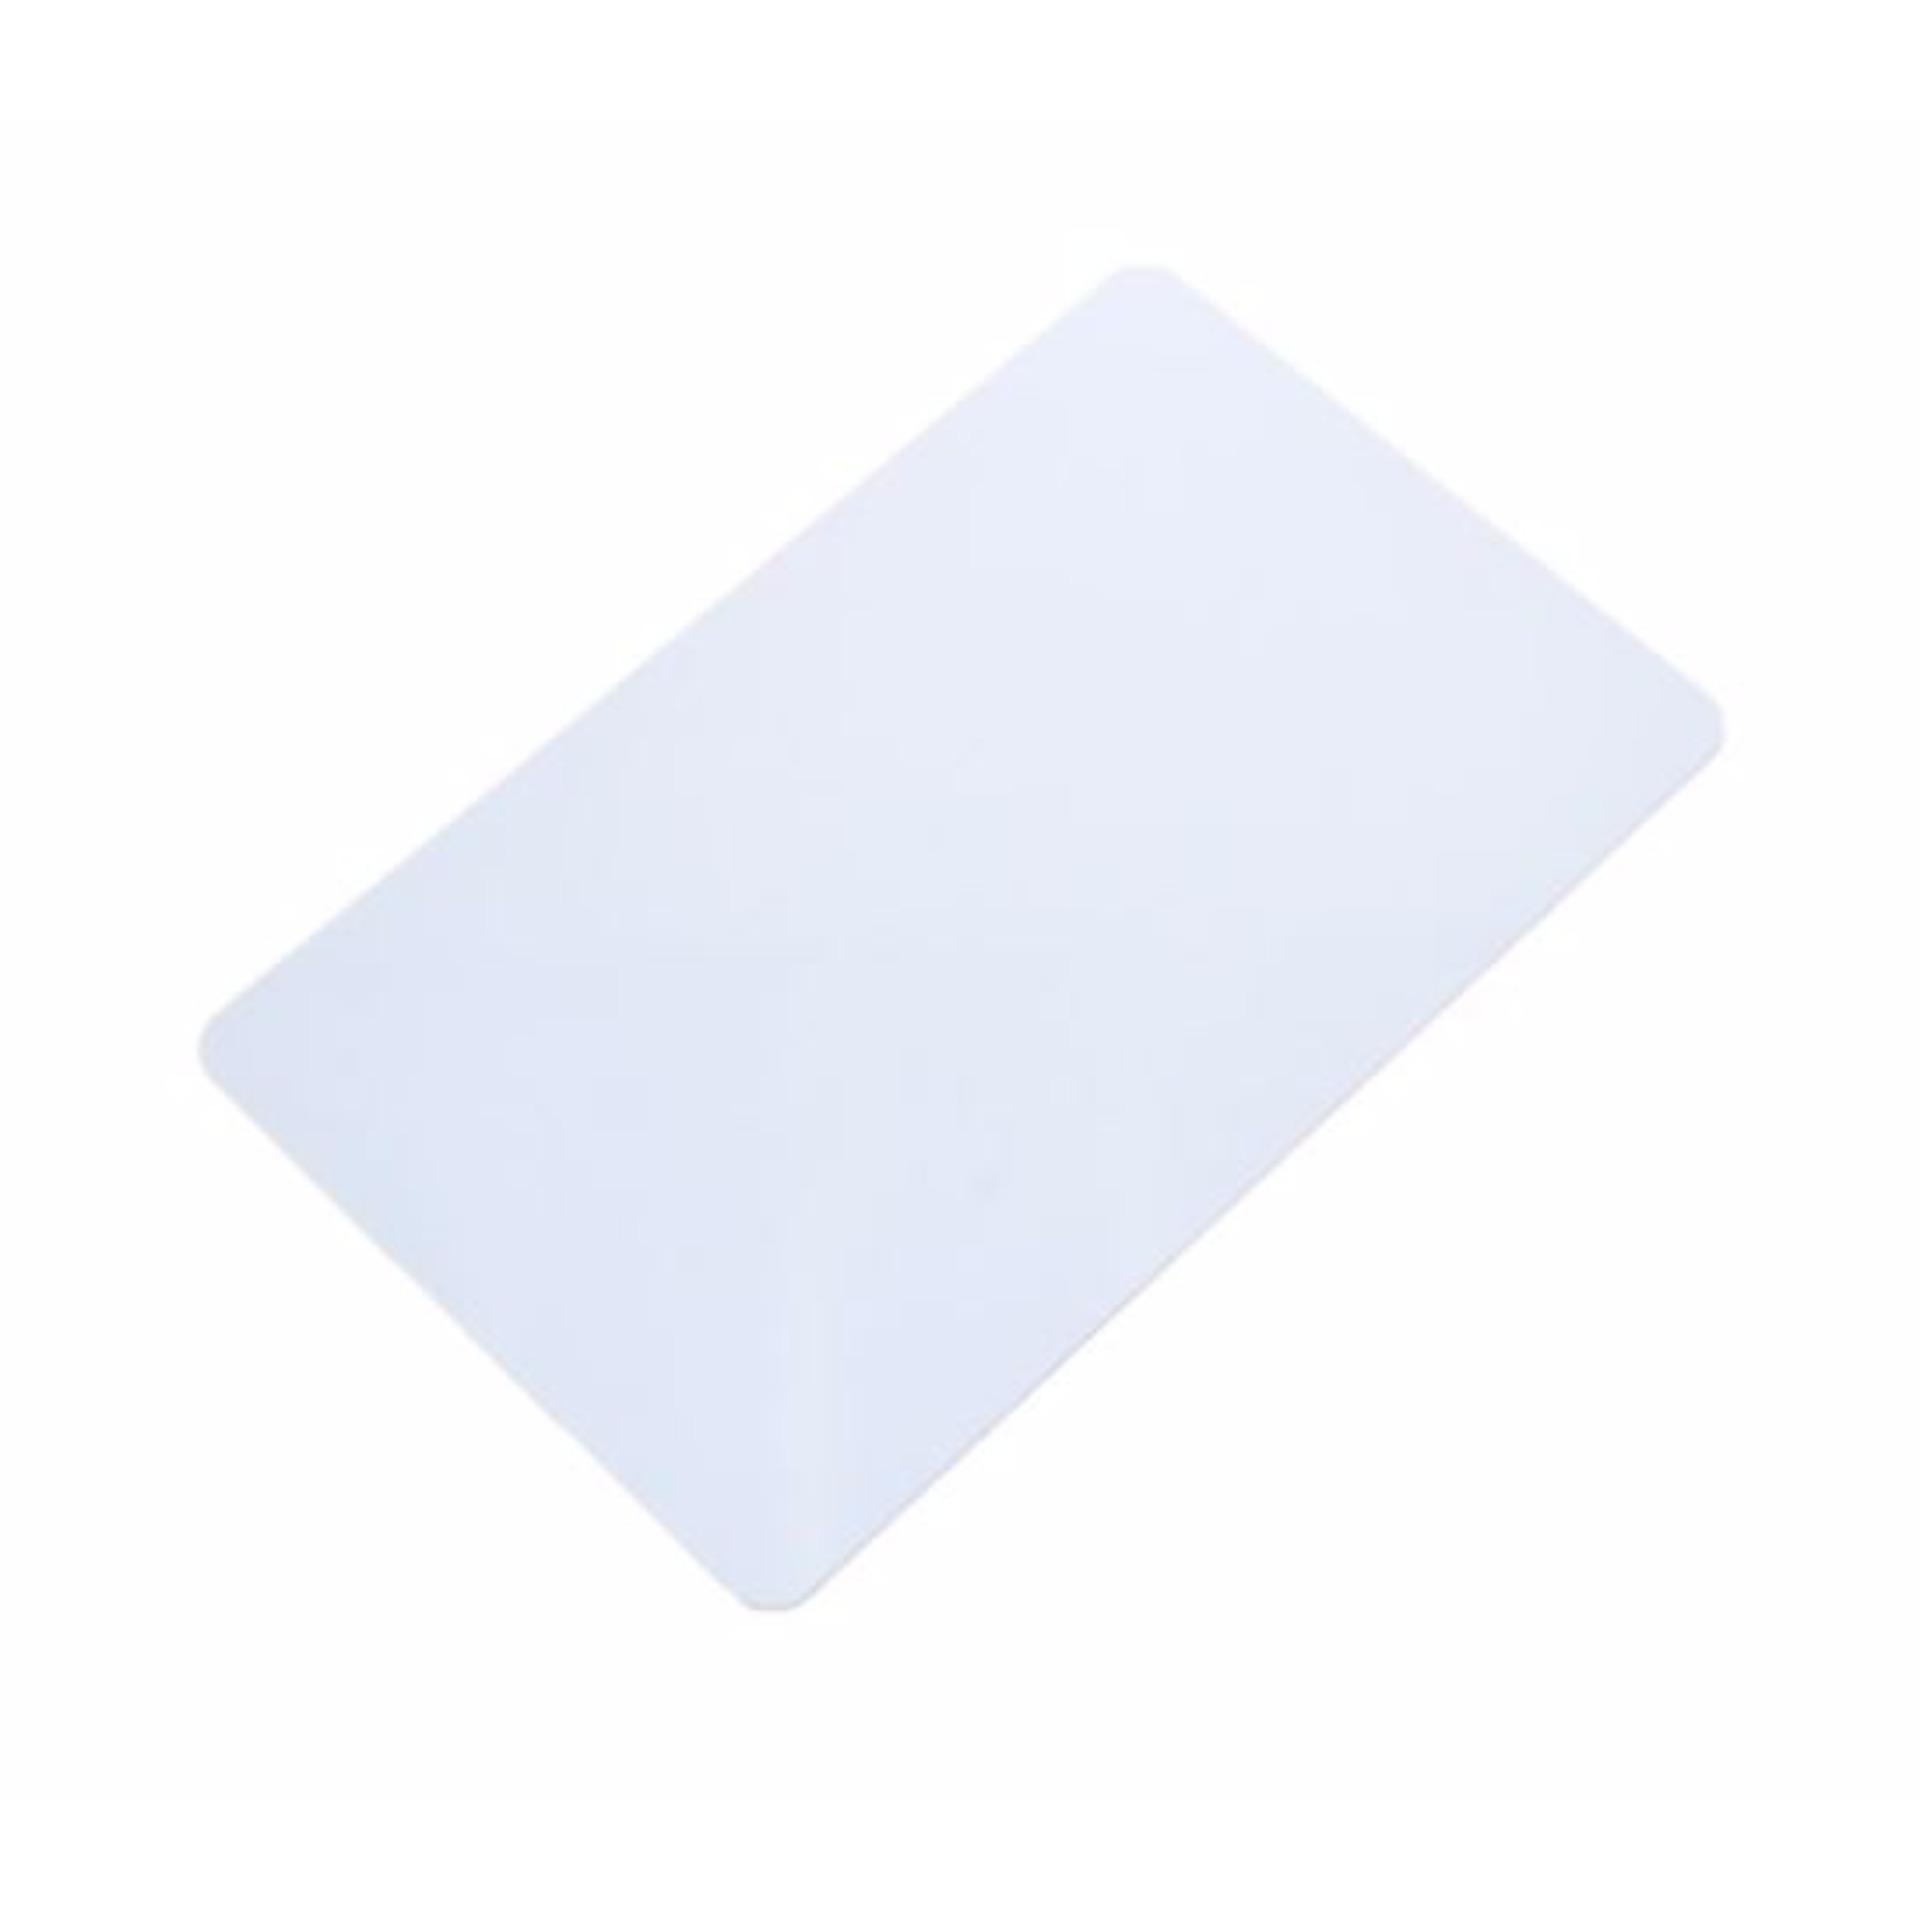 Philippines | (COD) MFRC-522 RC522 RFID Reader, Card, Tag